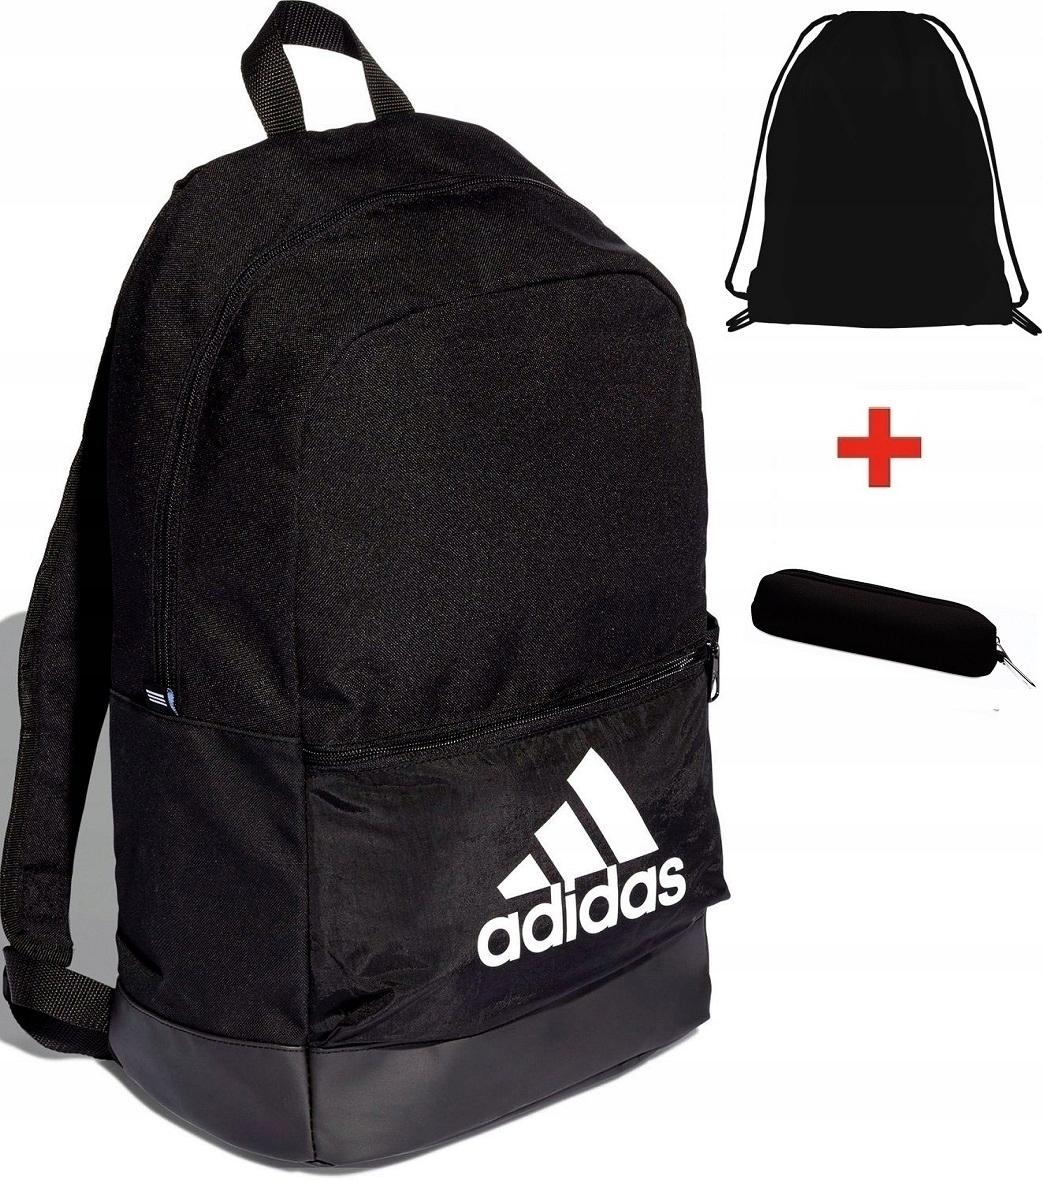 Zestaw Plecak Adidas Piornik Worek Na Buty Dt2628 9546717582 Allegro Pl